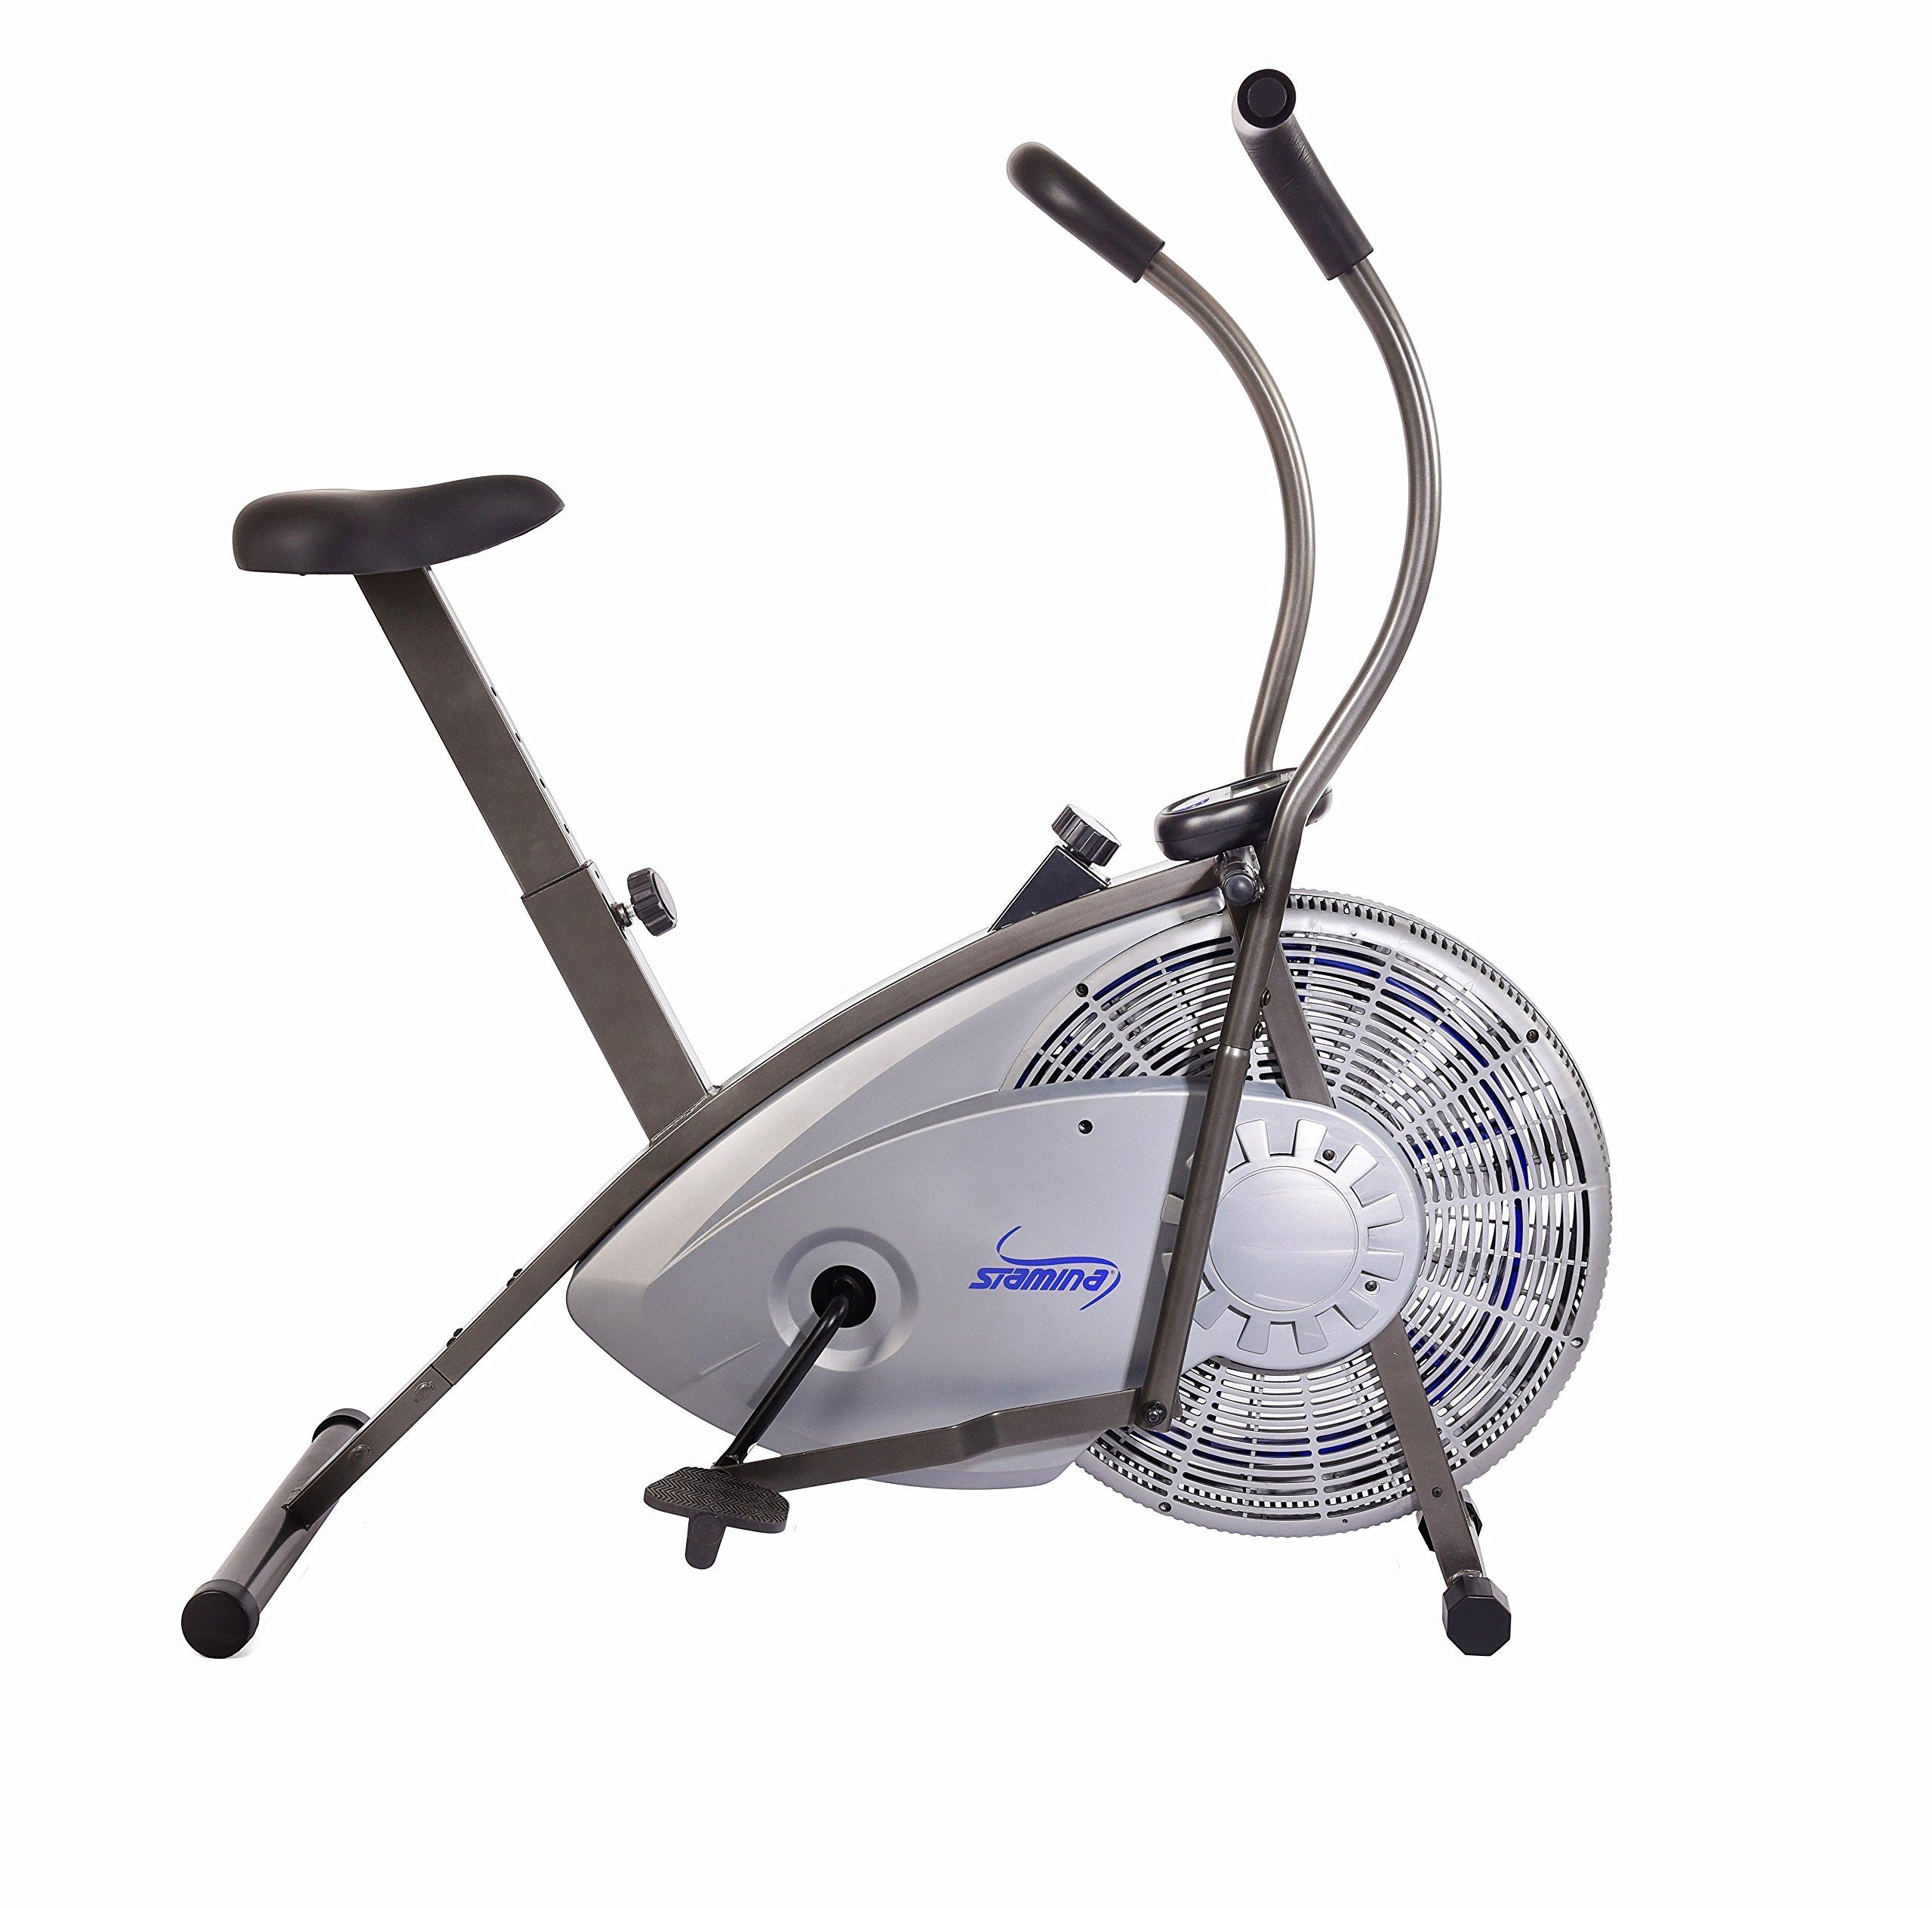 Stamina ATS Air Resistance Exercise Bike by Stamina